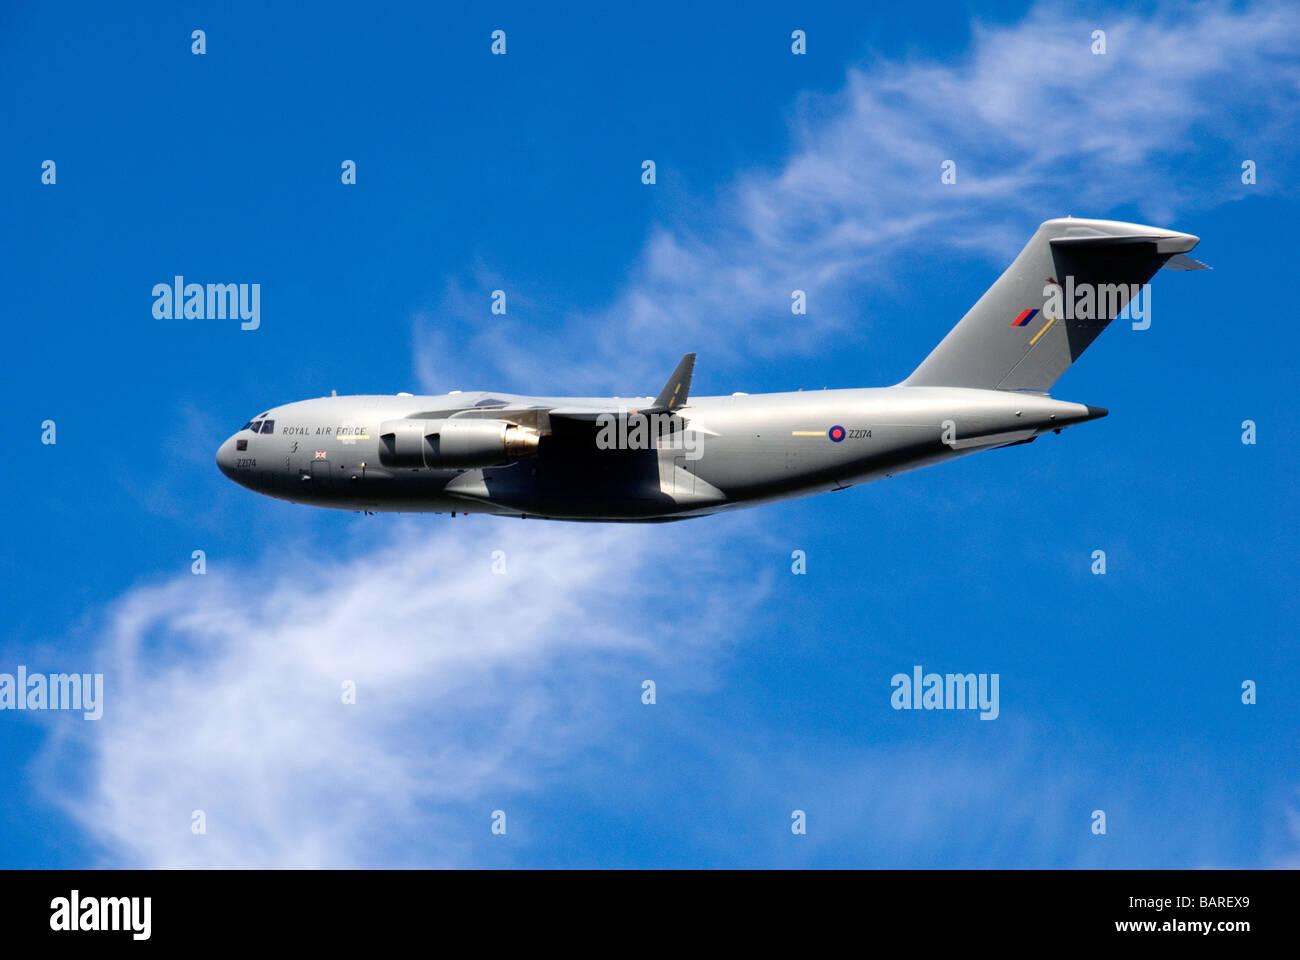 A C-17 Globemaster Military Transport Plane in Flight - Stock Image